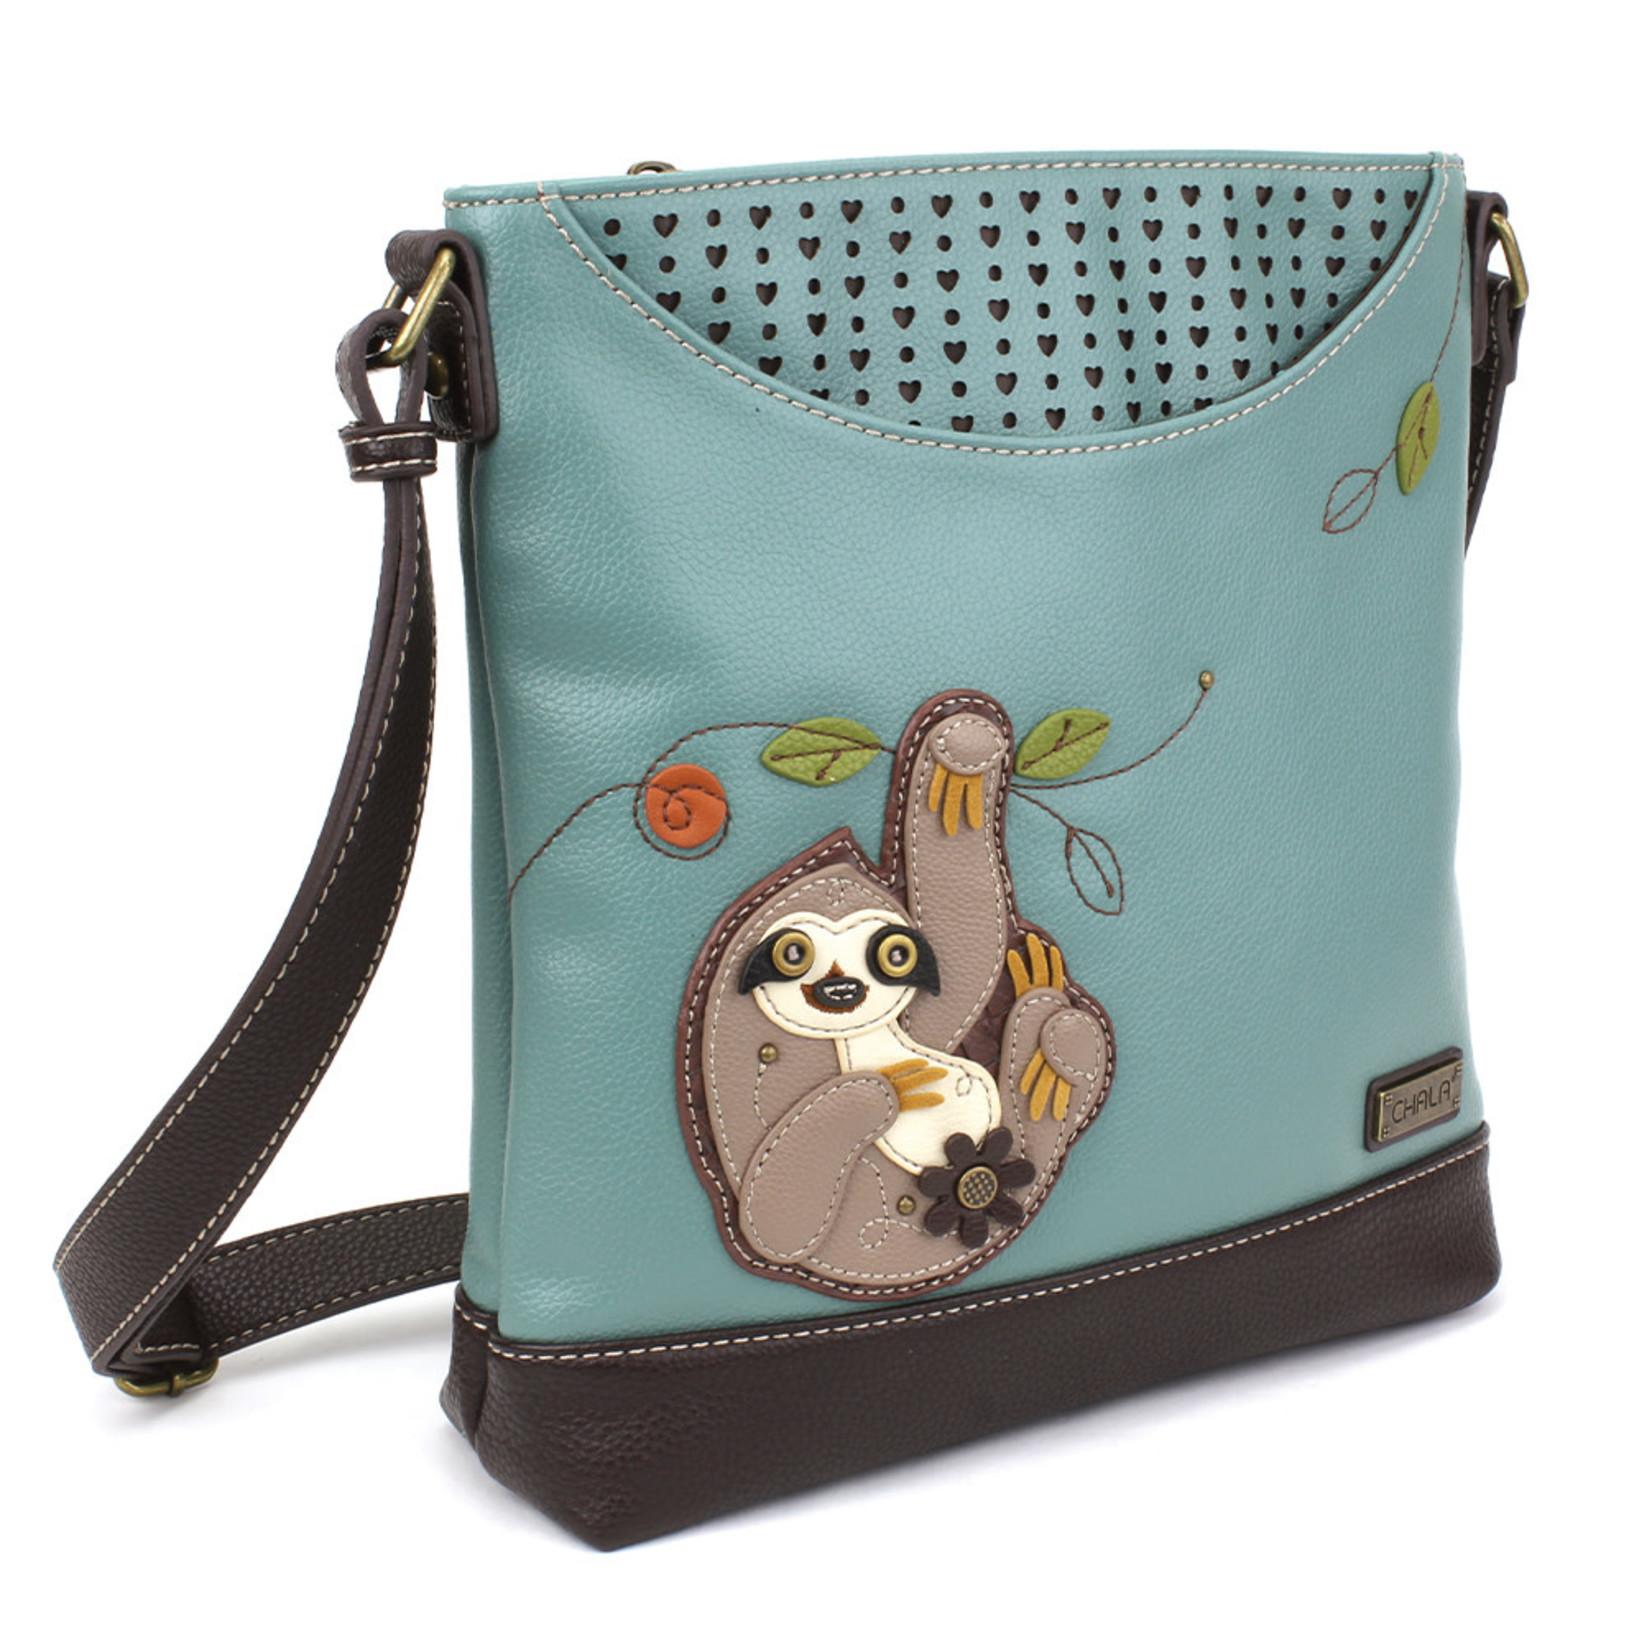 Chala Sweet Messenger - Sloth